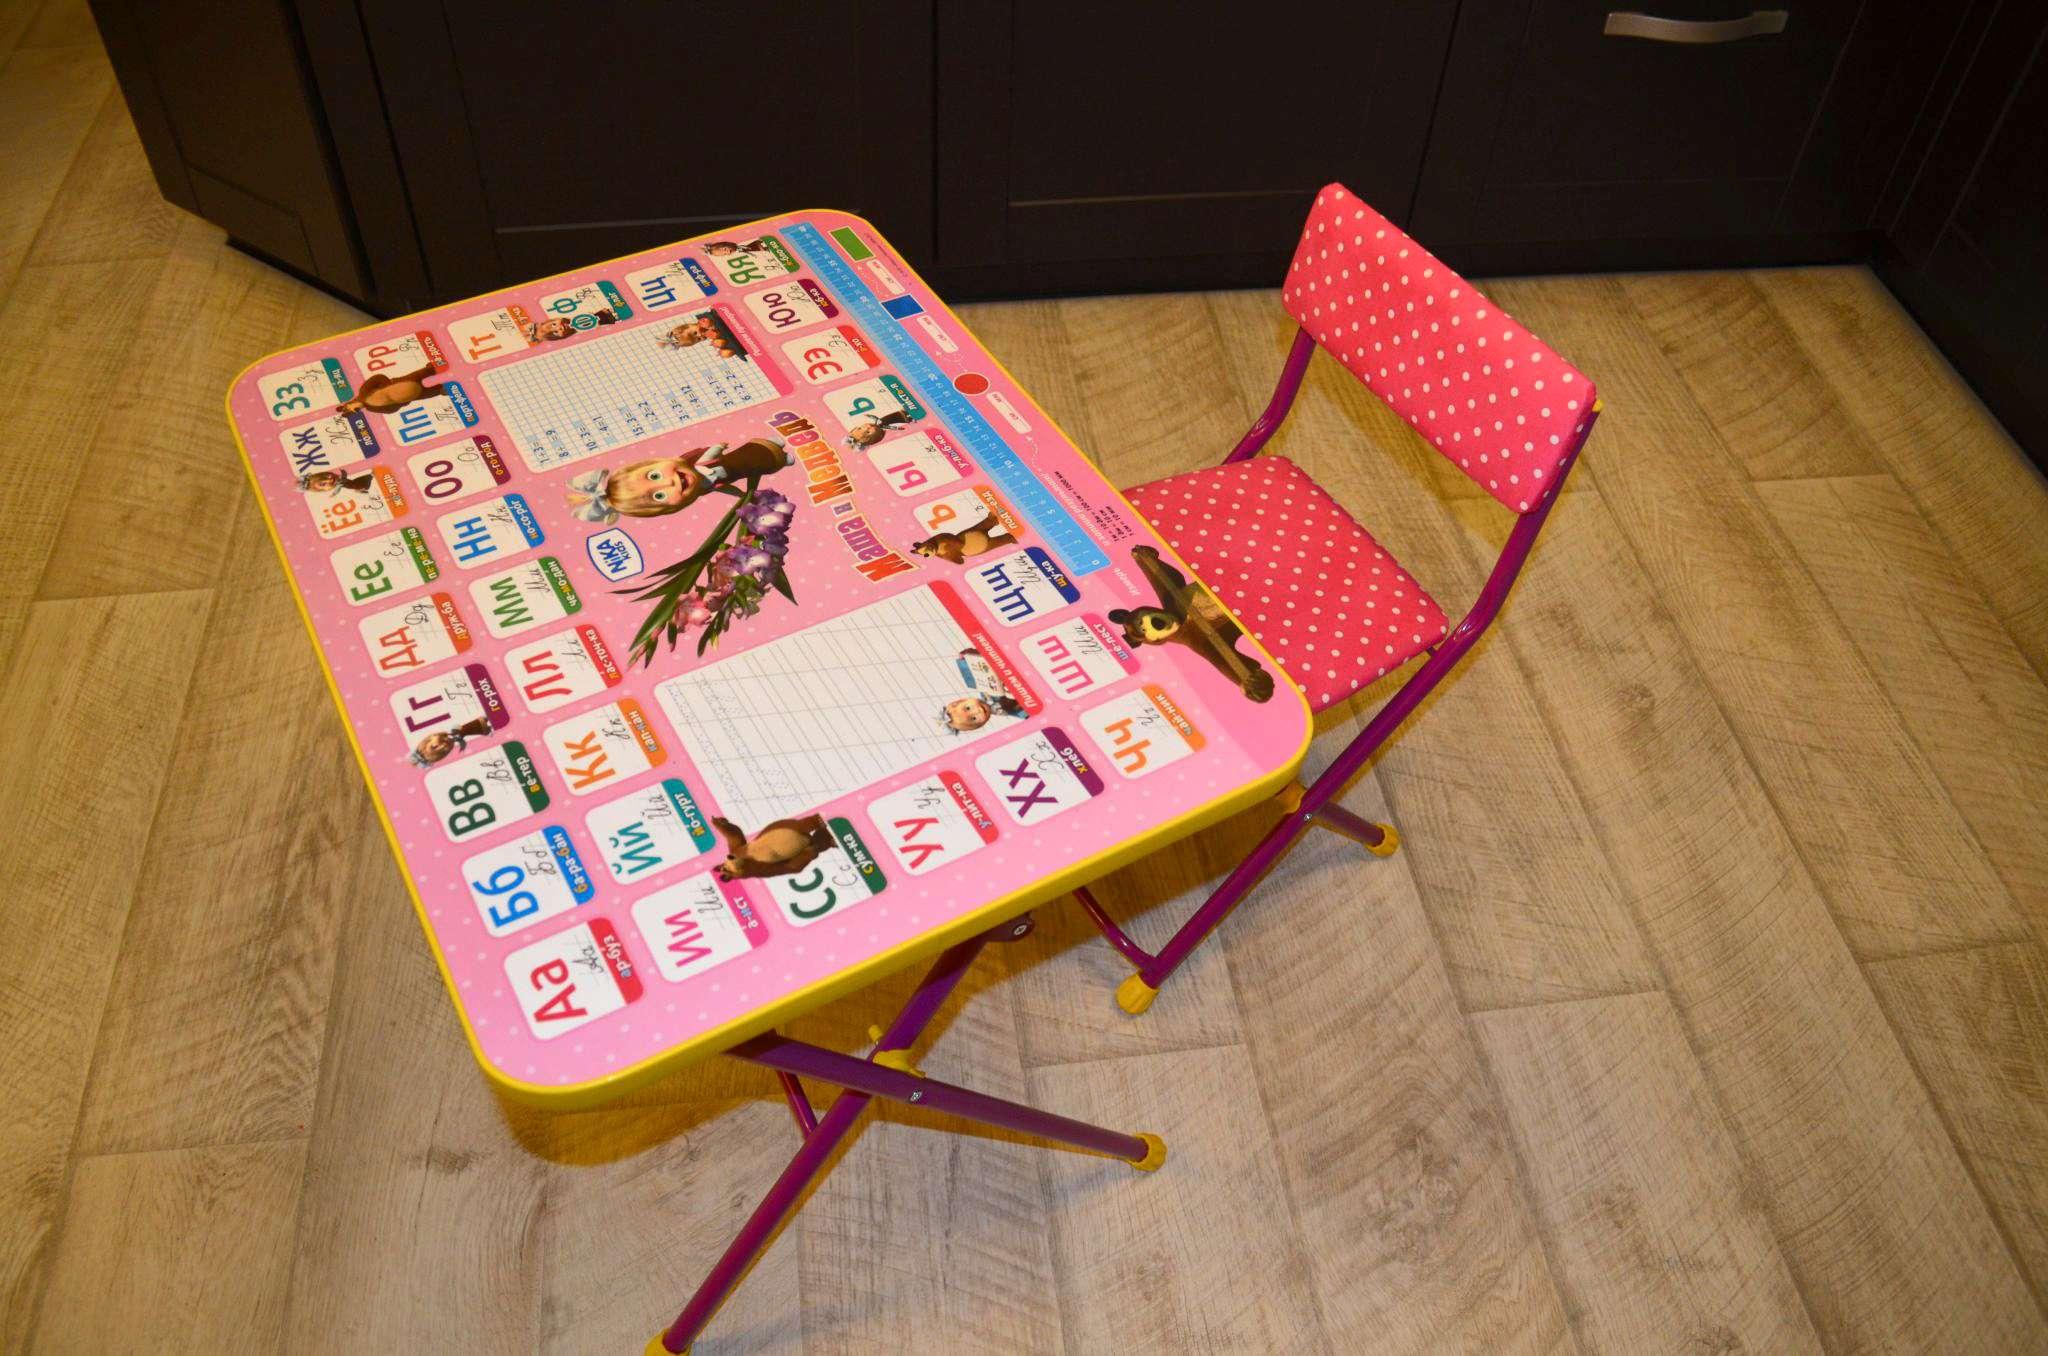 набор детской мебели ника умничка стол стул маша и медведь азбука 3